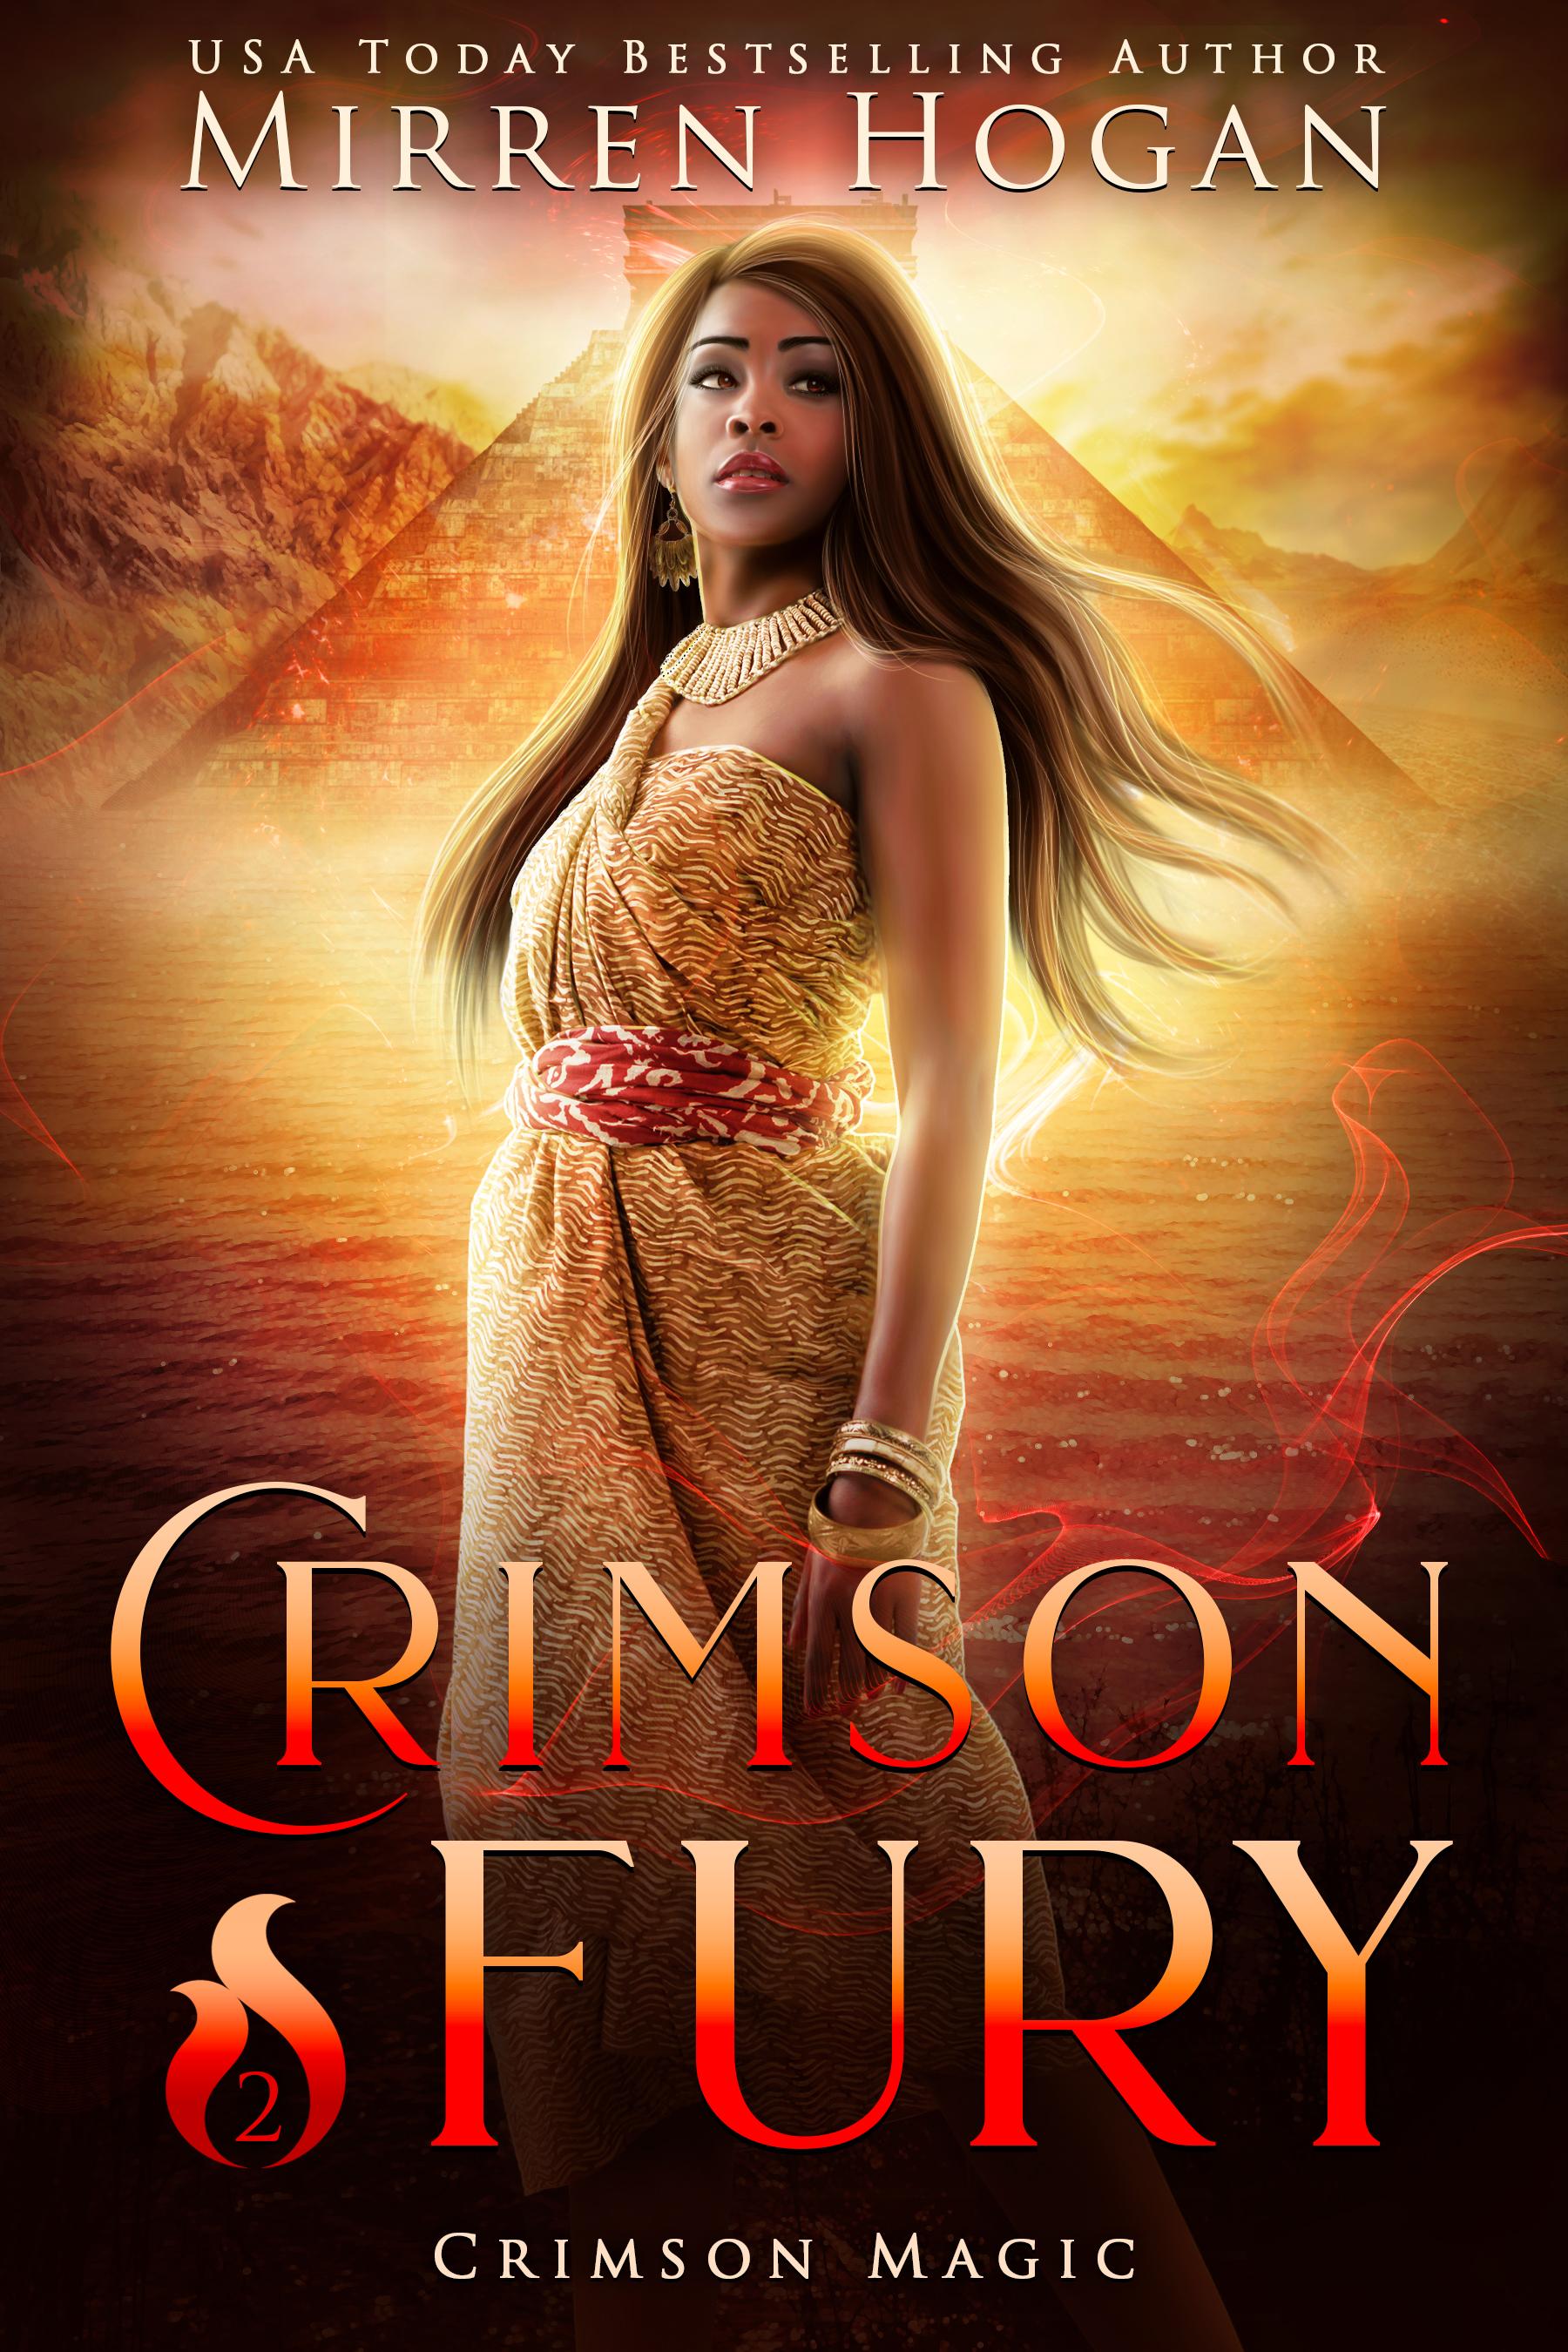 Crimson Fury